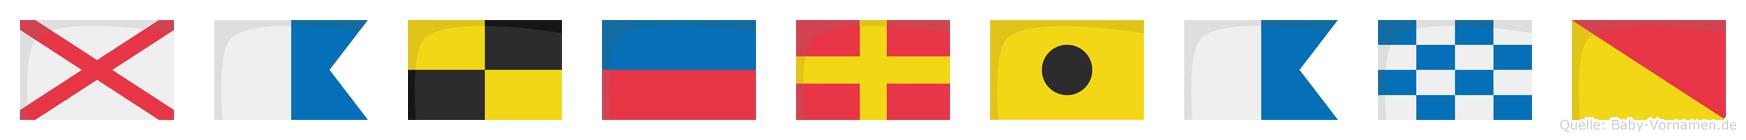 Valeriano im Flaggenalphabet